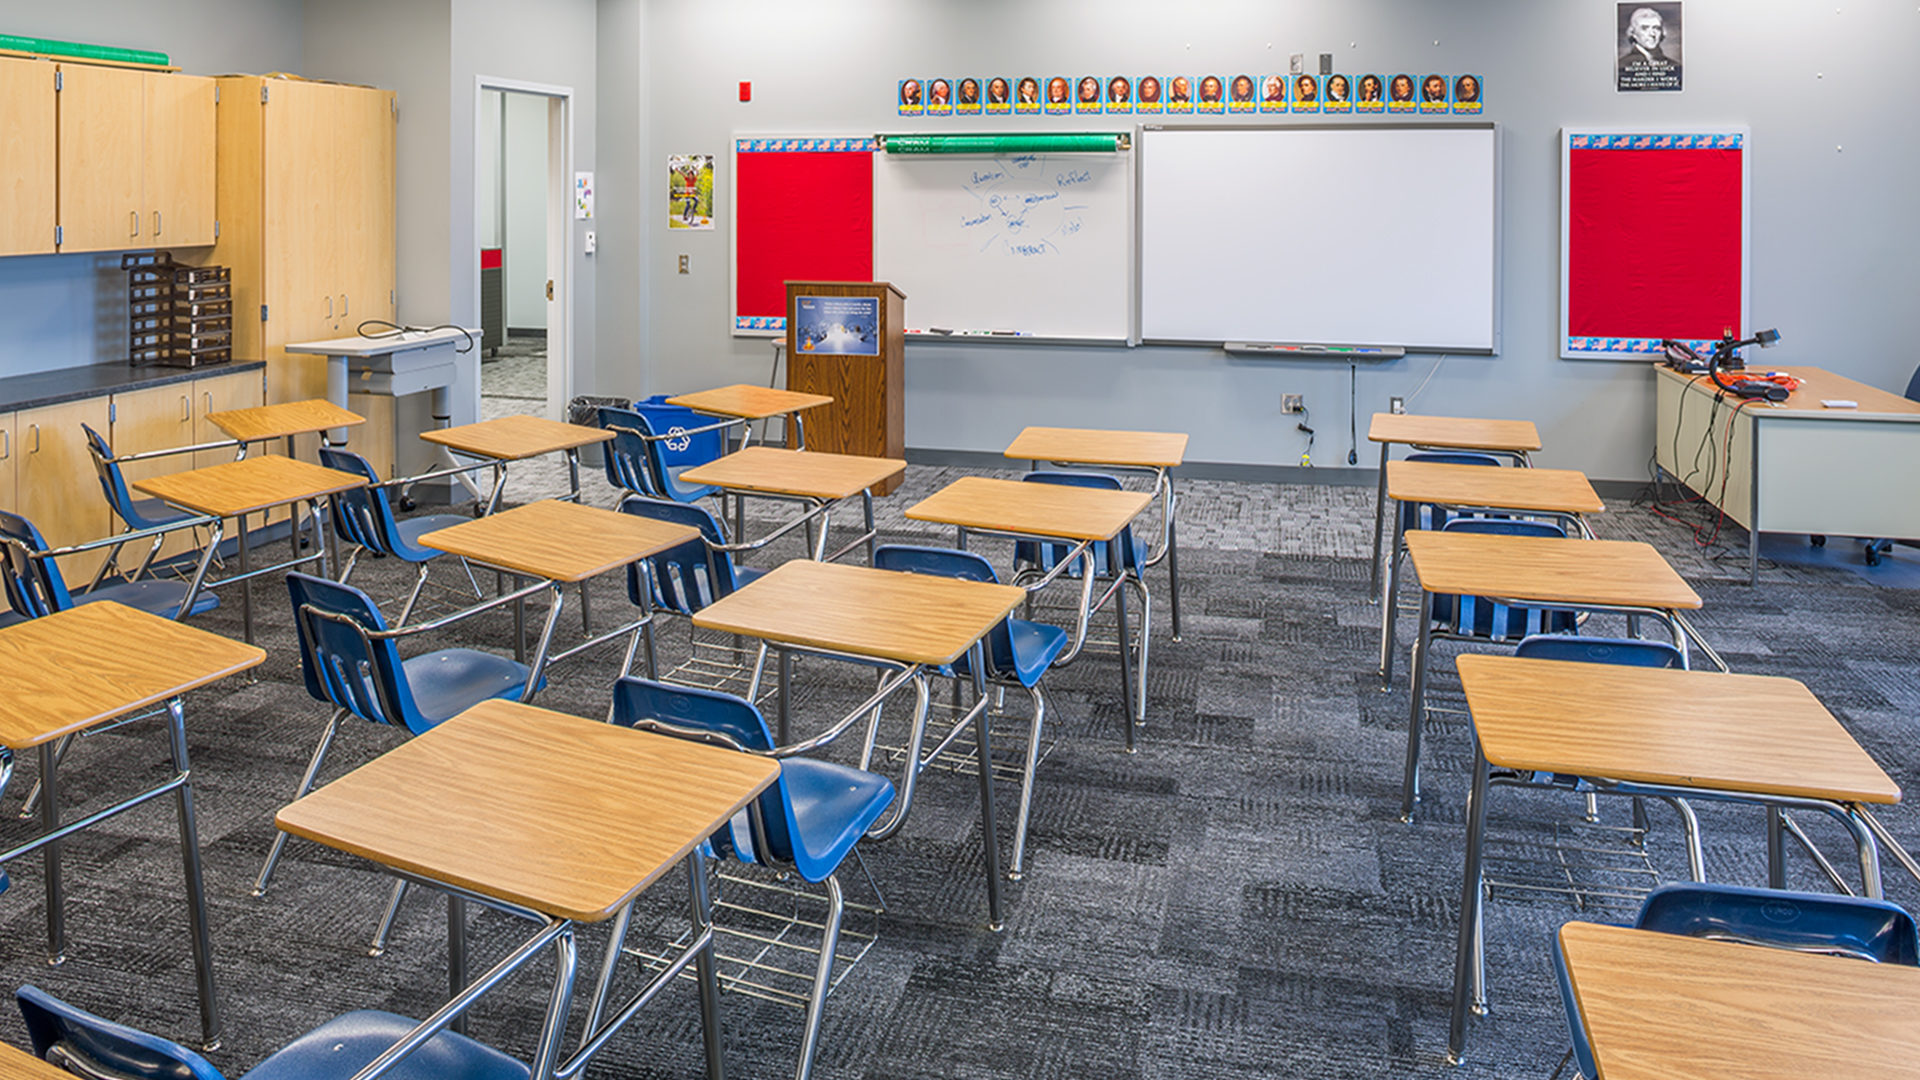 Erik Ramstad Middle School Interior Class Room